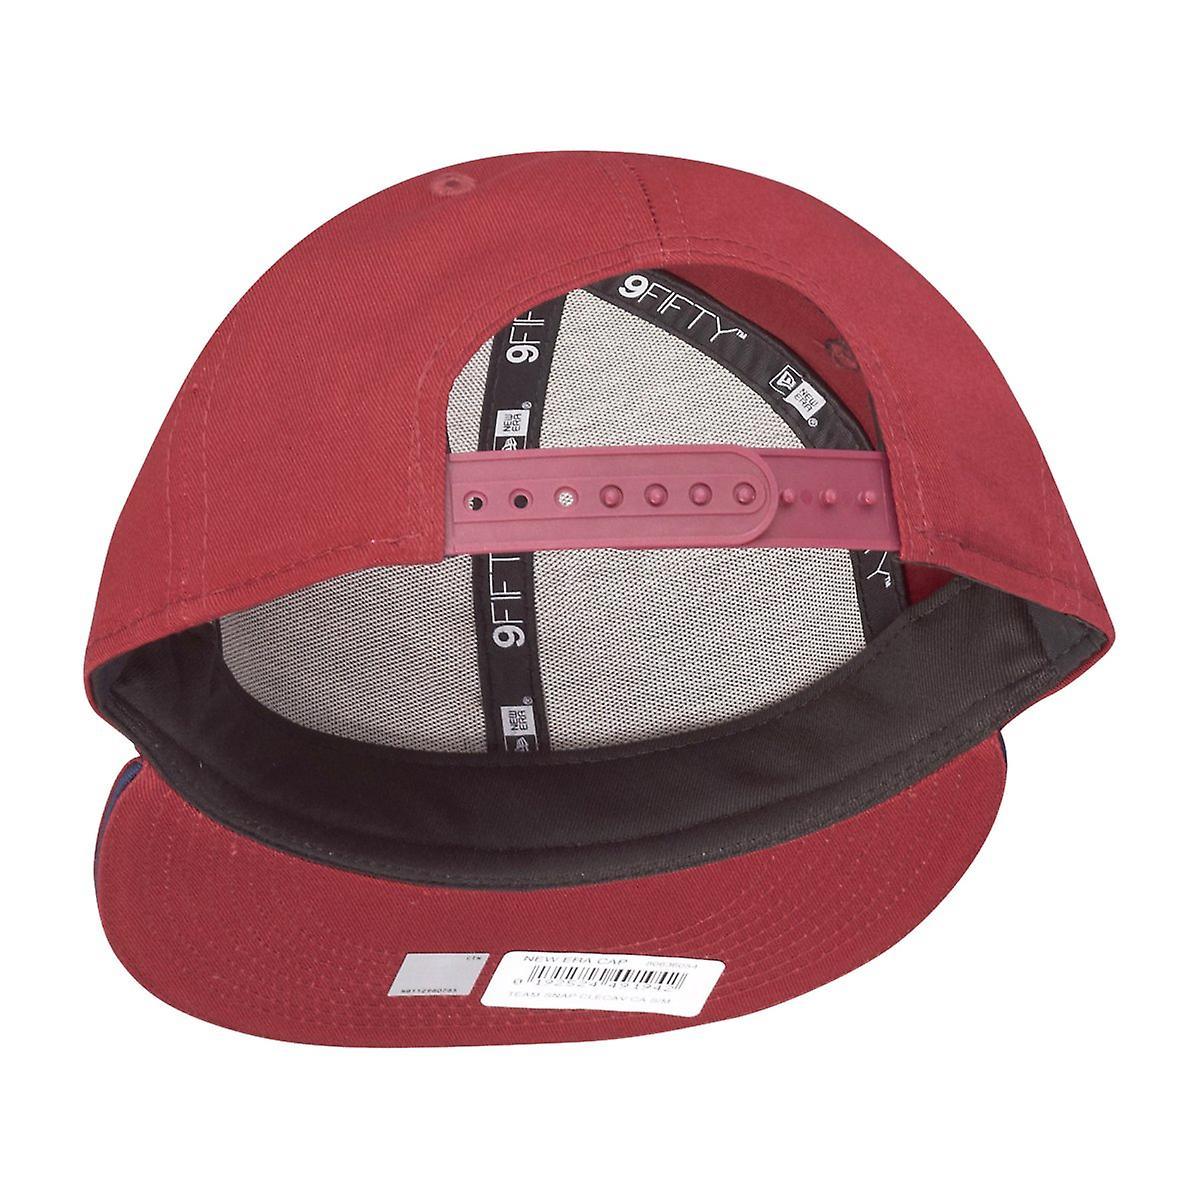 classic fit c1a8f a7e49 New era 9Fifty Snapback Cap - Cleveland Cavaliers Red